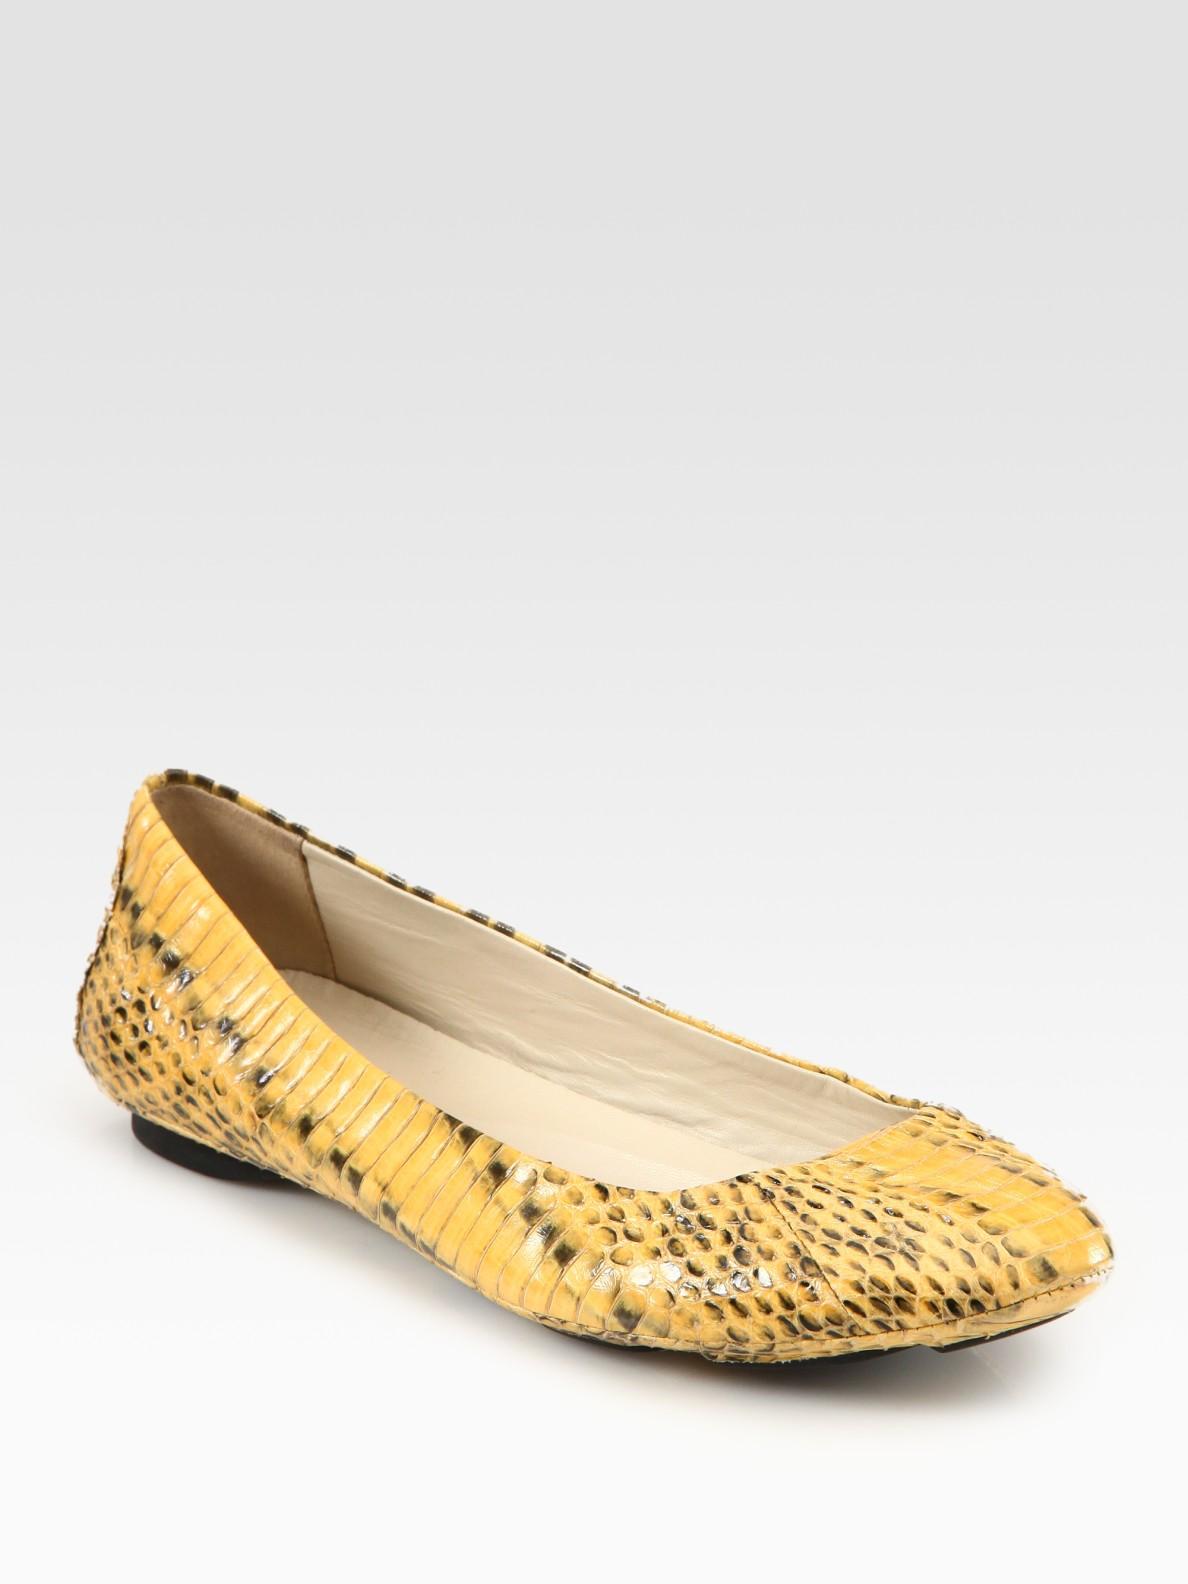 Kors By Michael Kors Odette Snake Print Leather Ballet